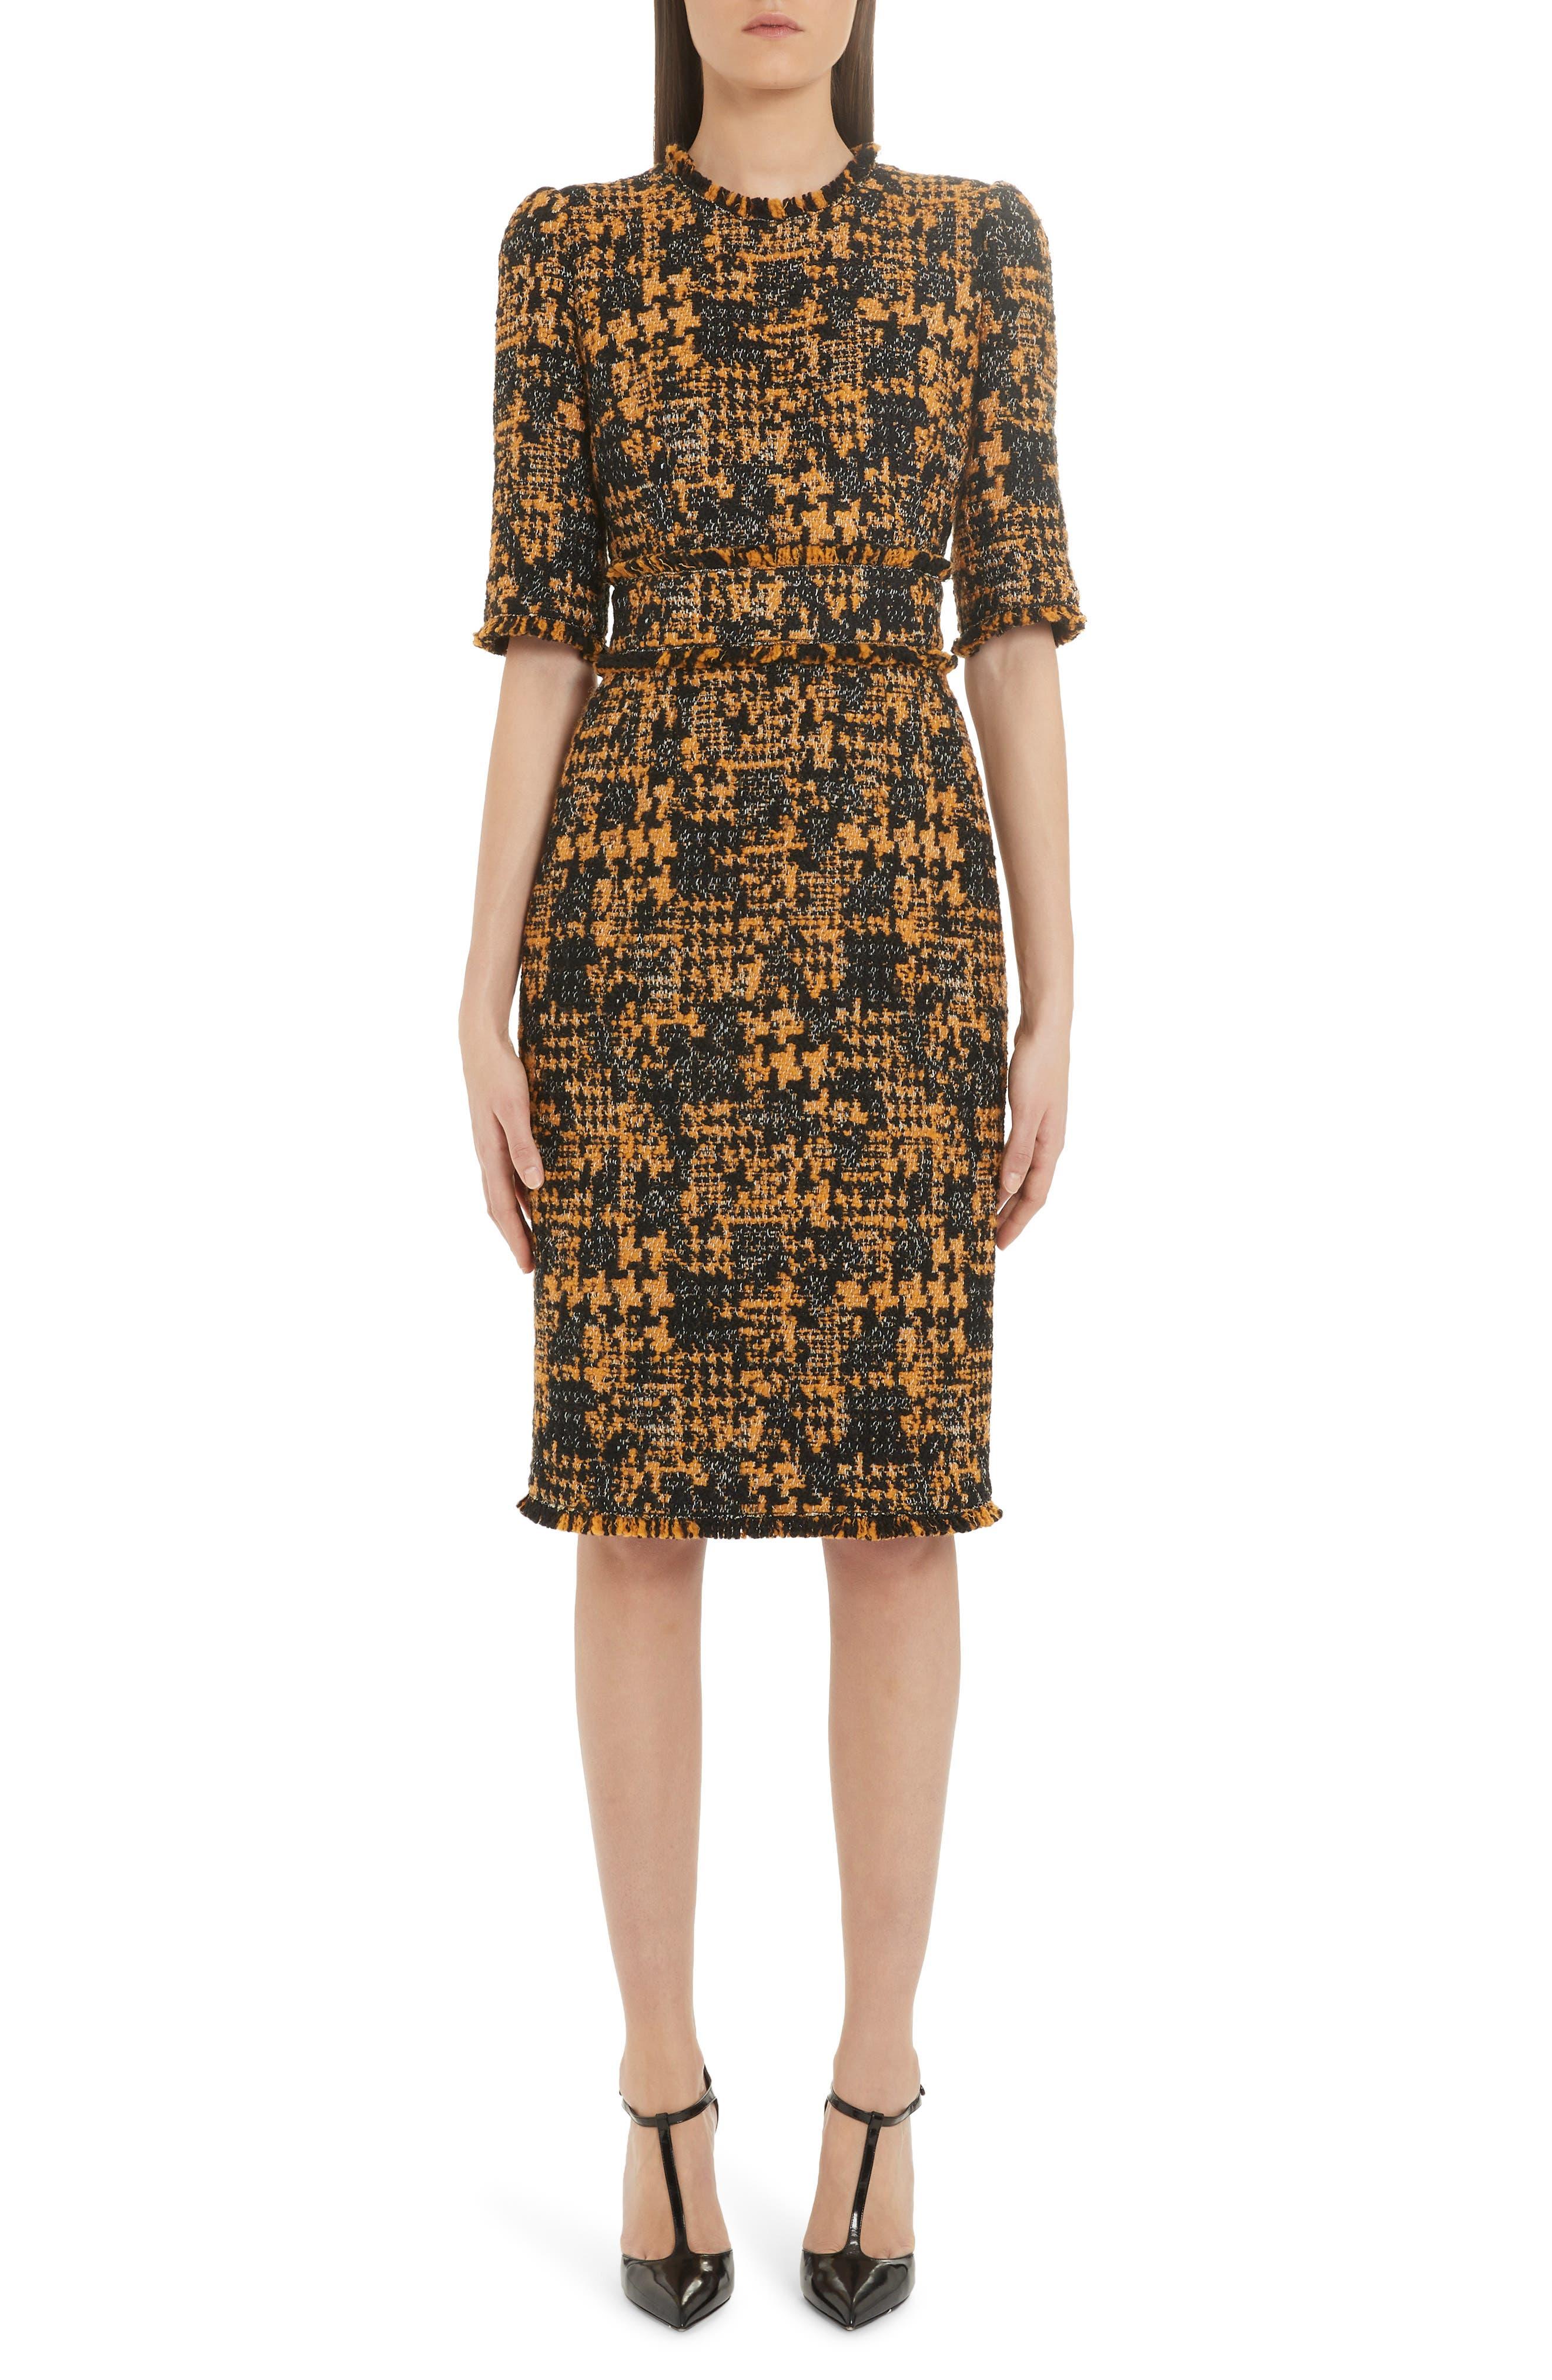 Dolce & gabbana Tweed Sheath Dress, US / 40 IT - Brown